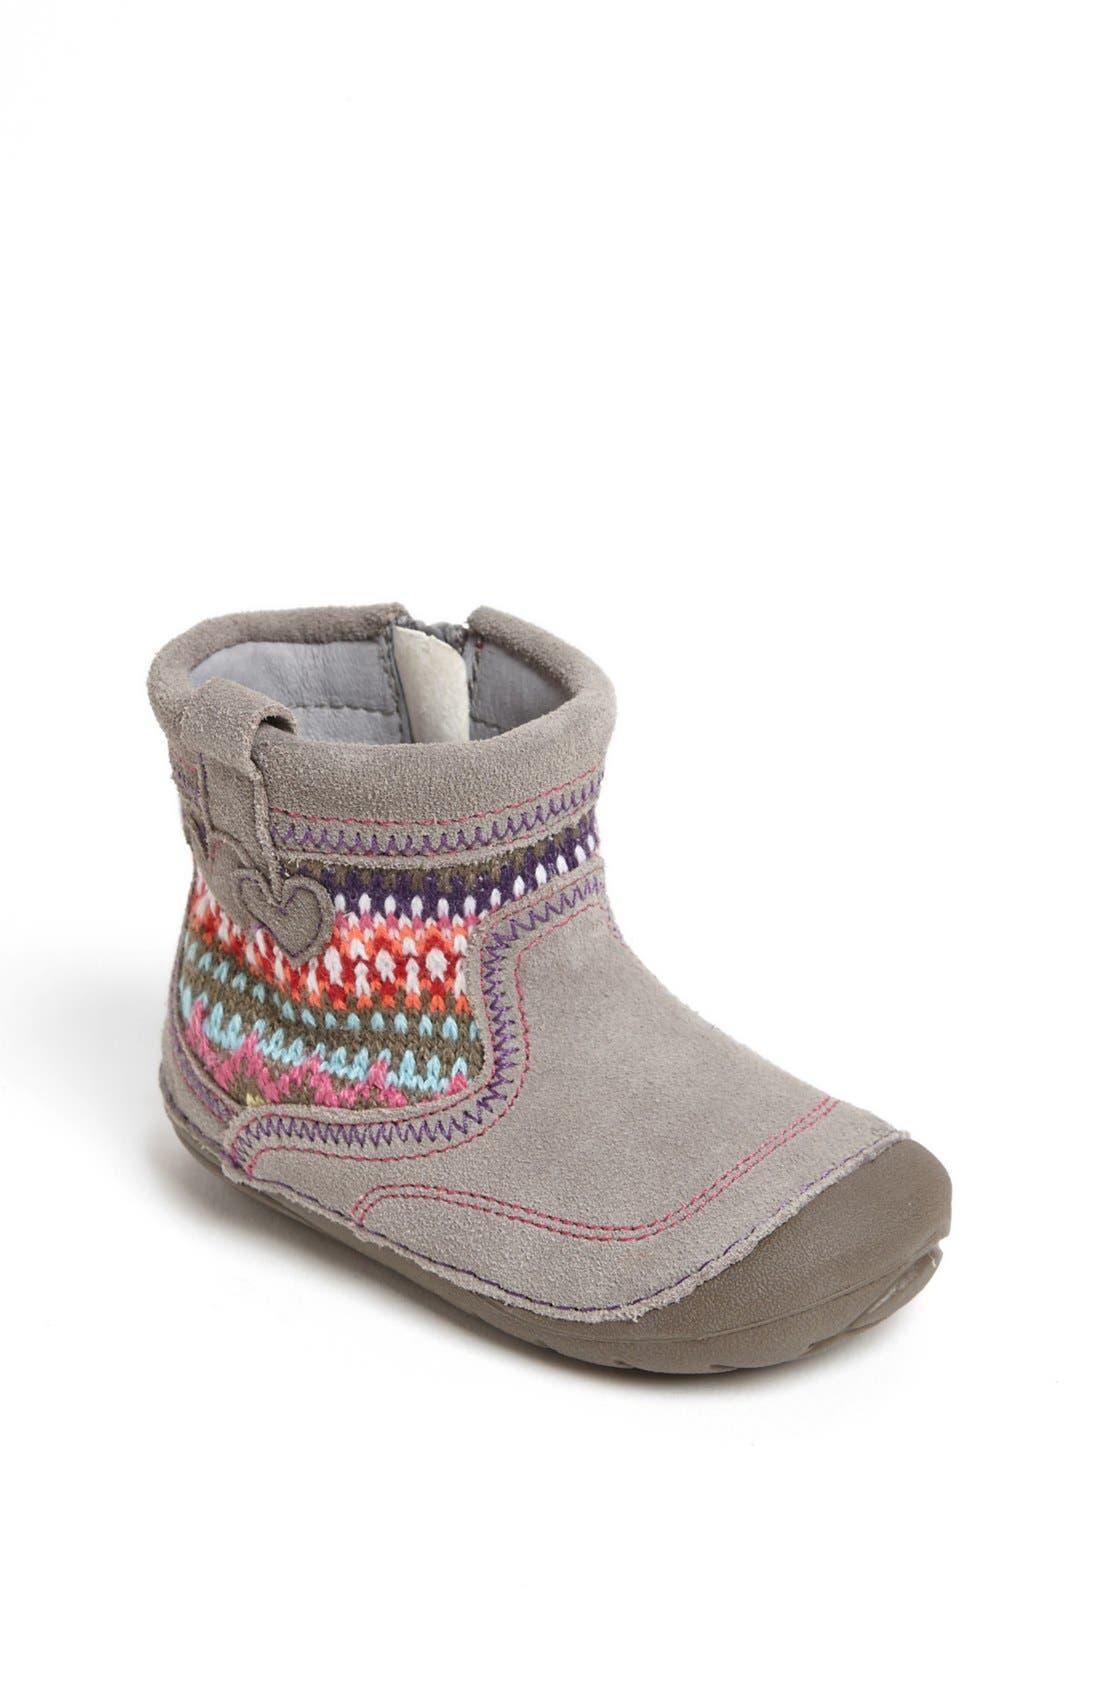 Alternate Image 1 Selected - Stride Rite 'SRT Ainsley' Boot (Baby & Walker)